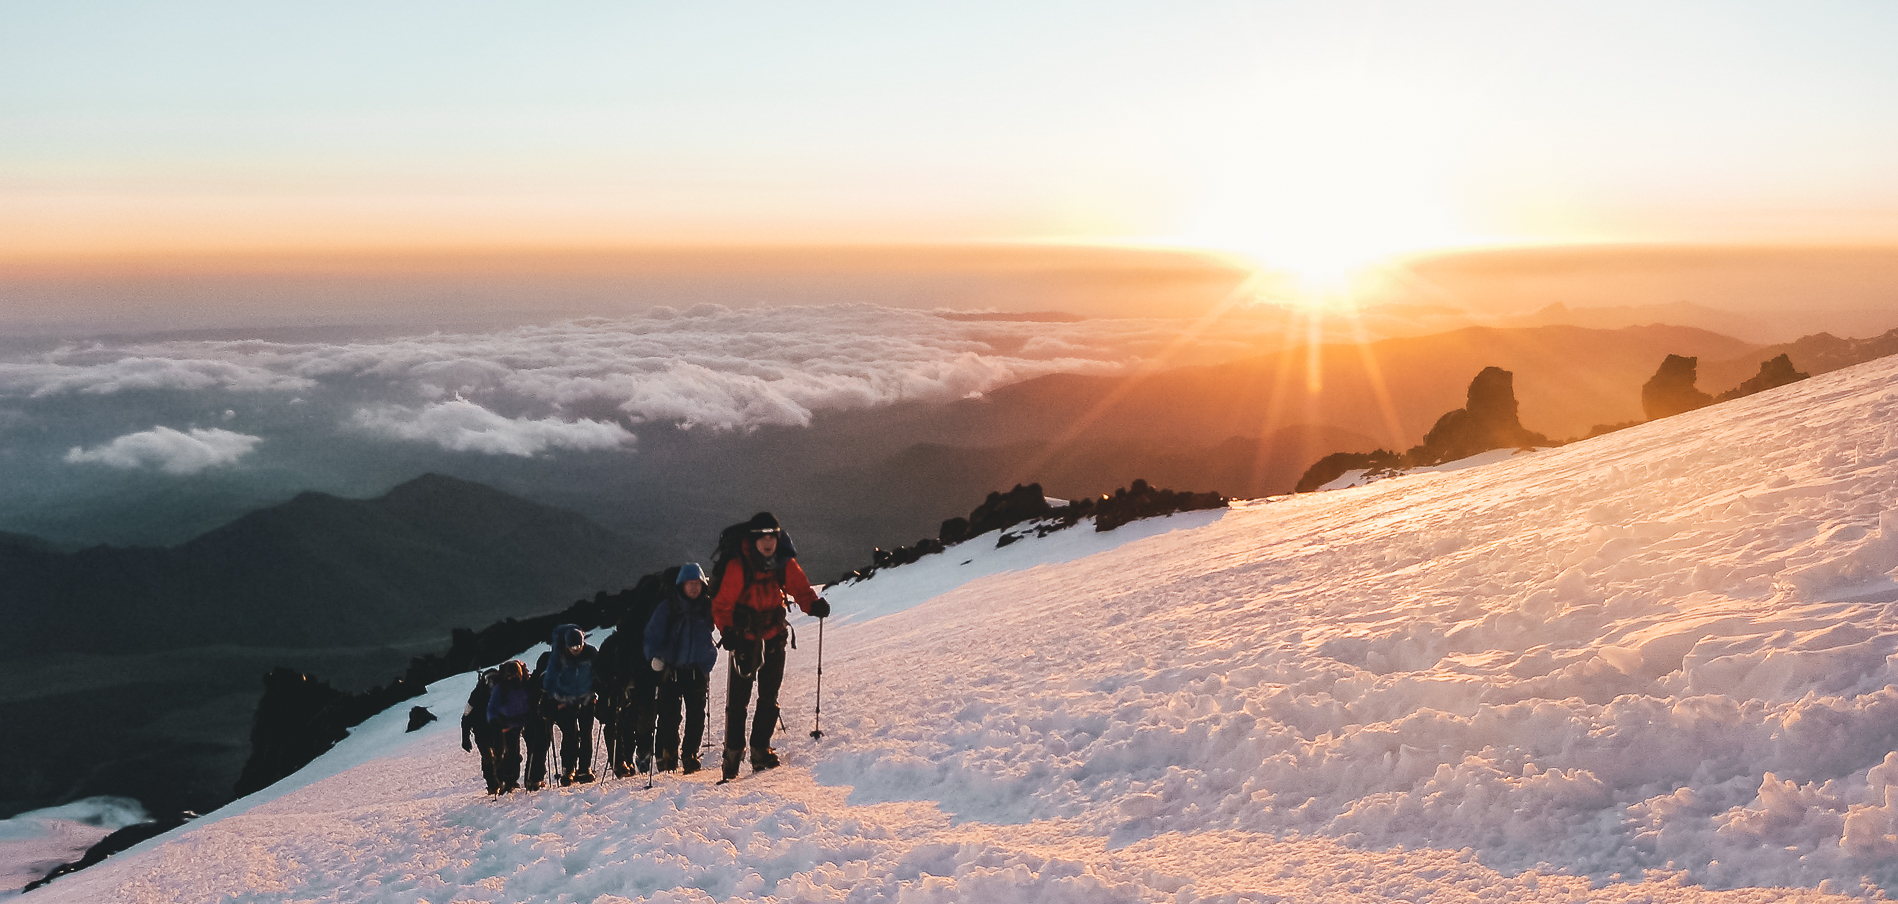 Climb Elbrus with Earth's Edge